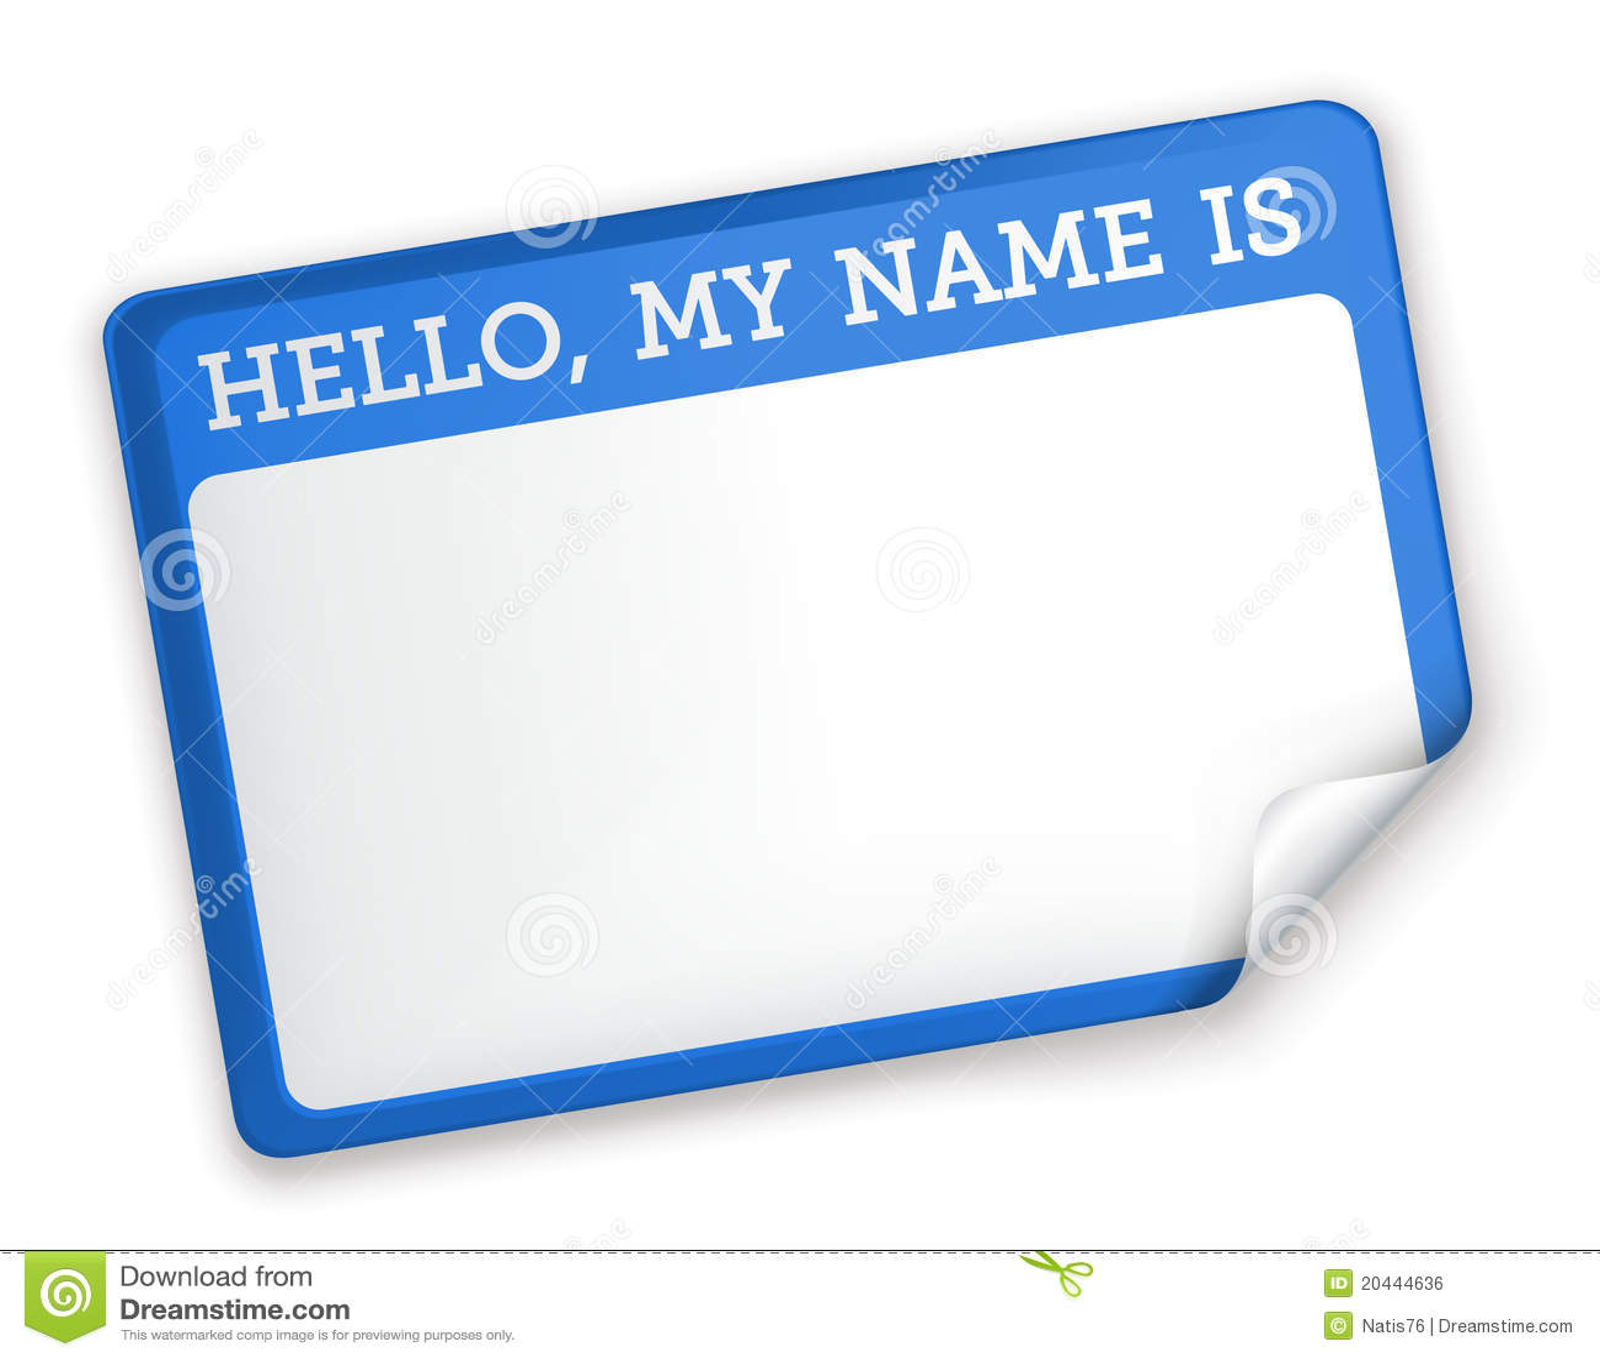 Name Tag Royalty Free Stock Image